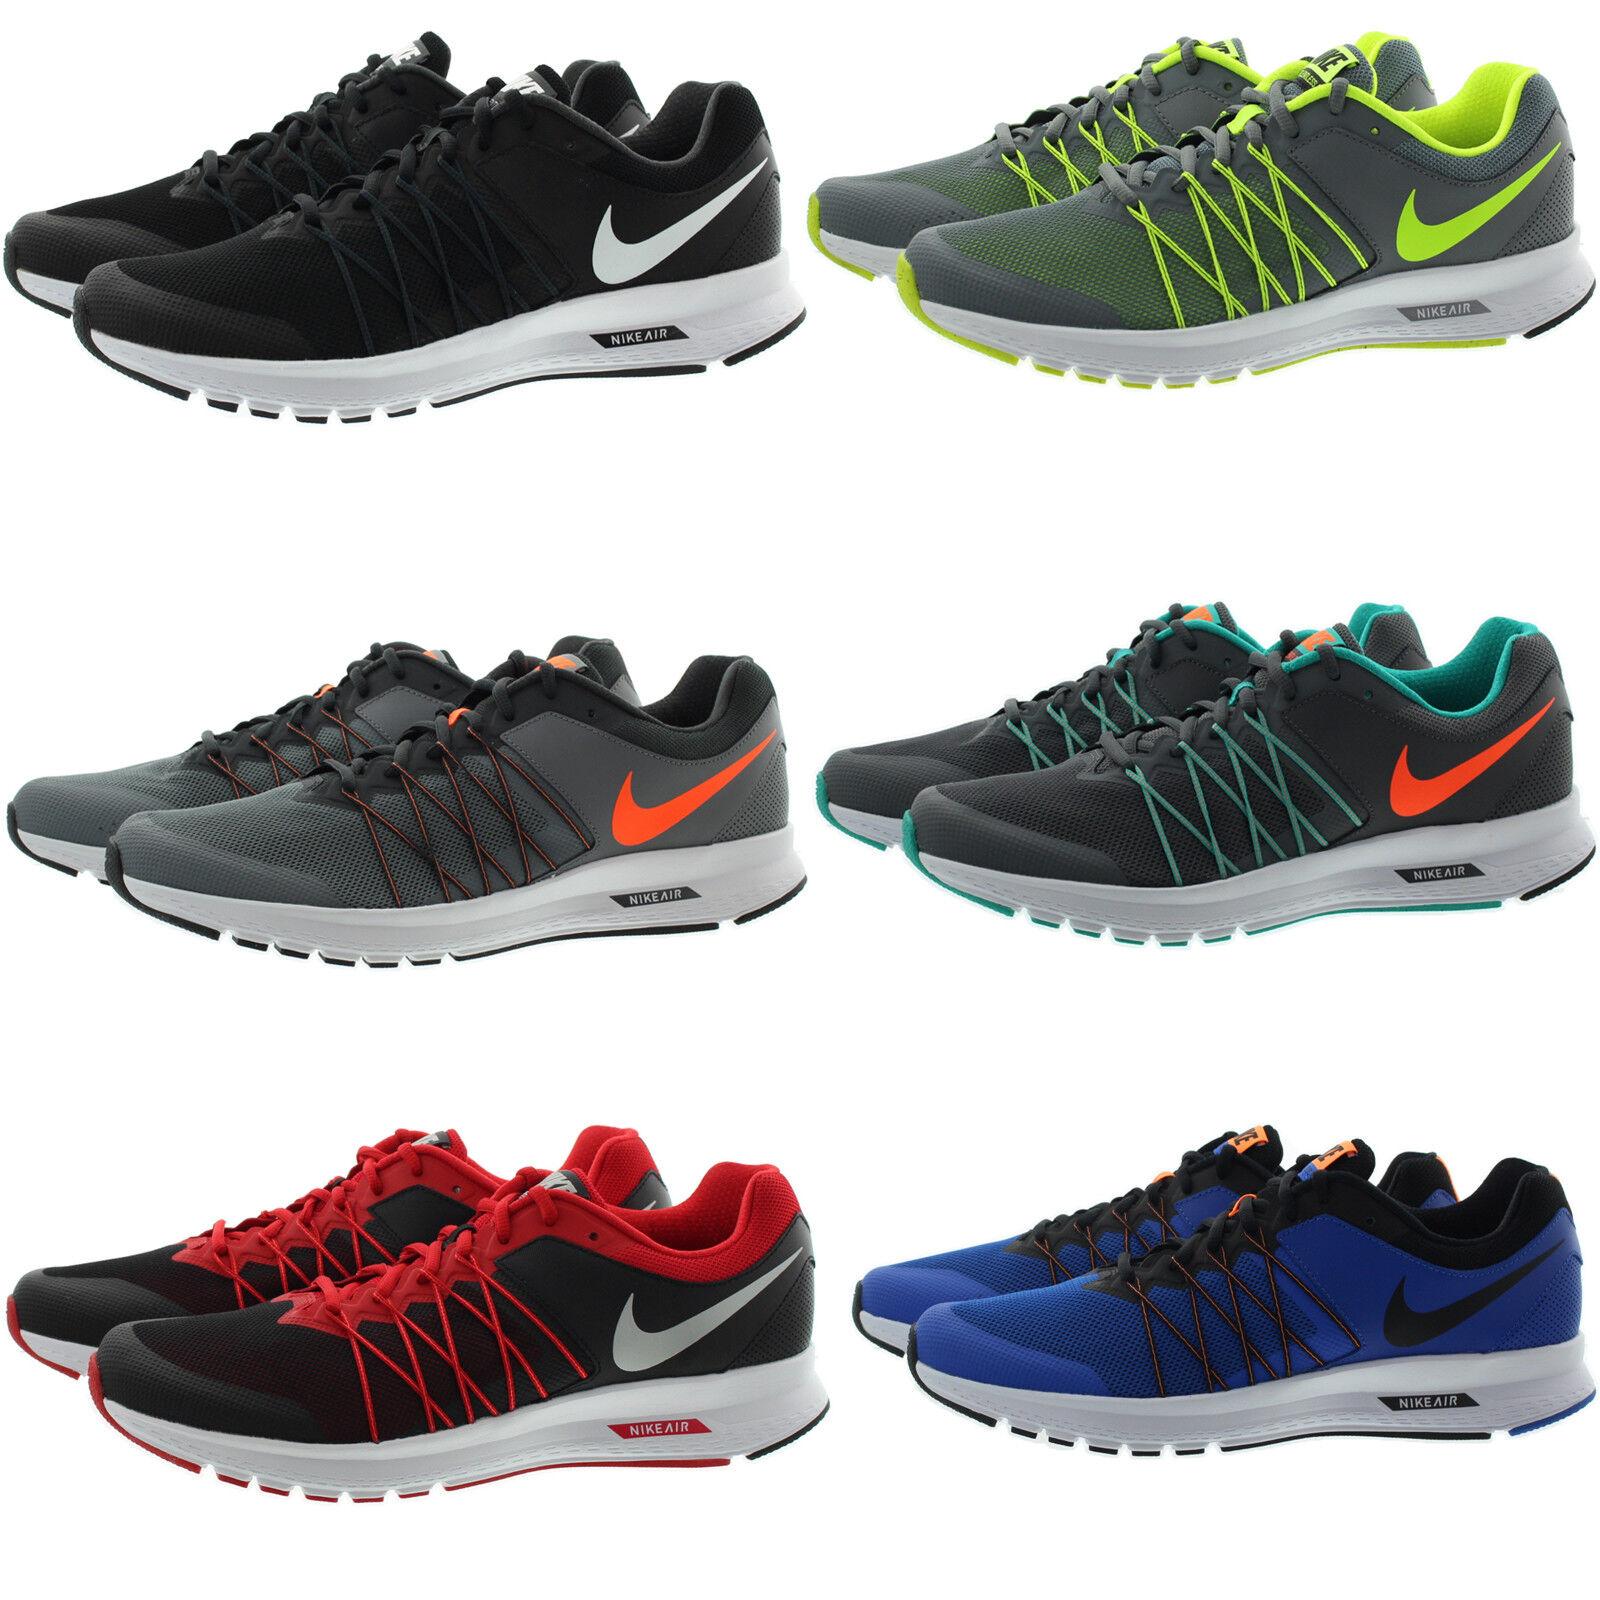 Nike 843836 Mens Air Relentless 6 Low Top Running Training shoes Sneakers